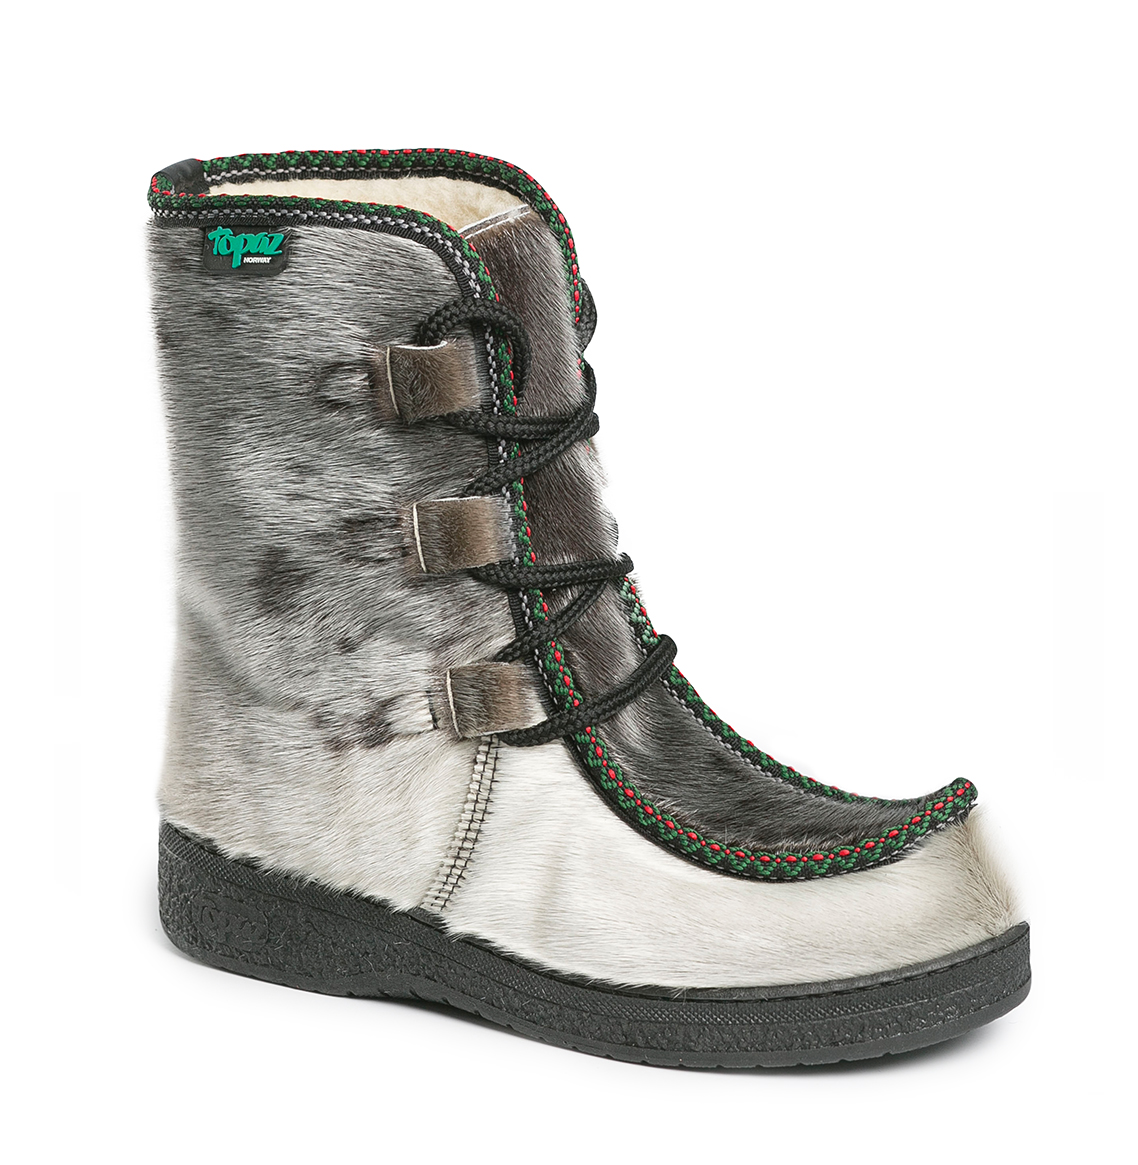 Sami 50 boots nature men - Topaz of Norway